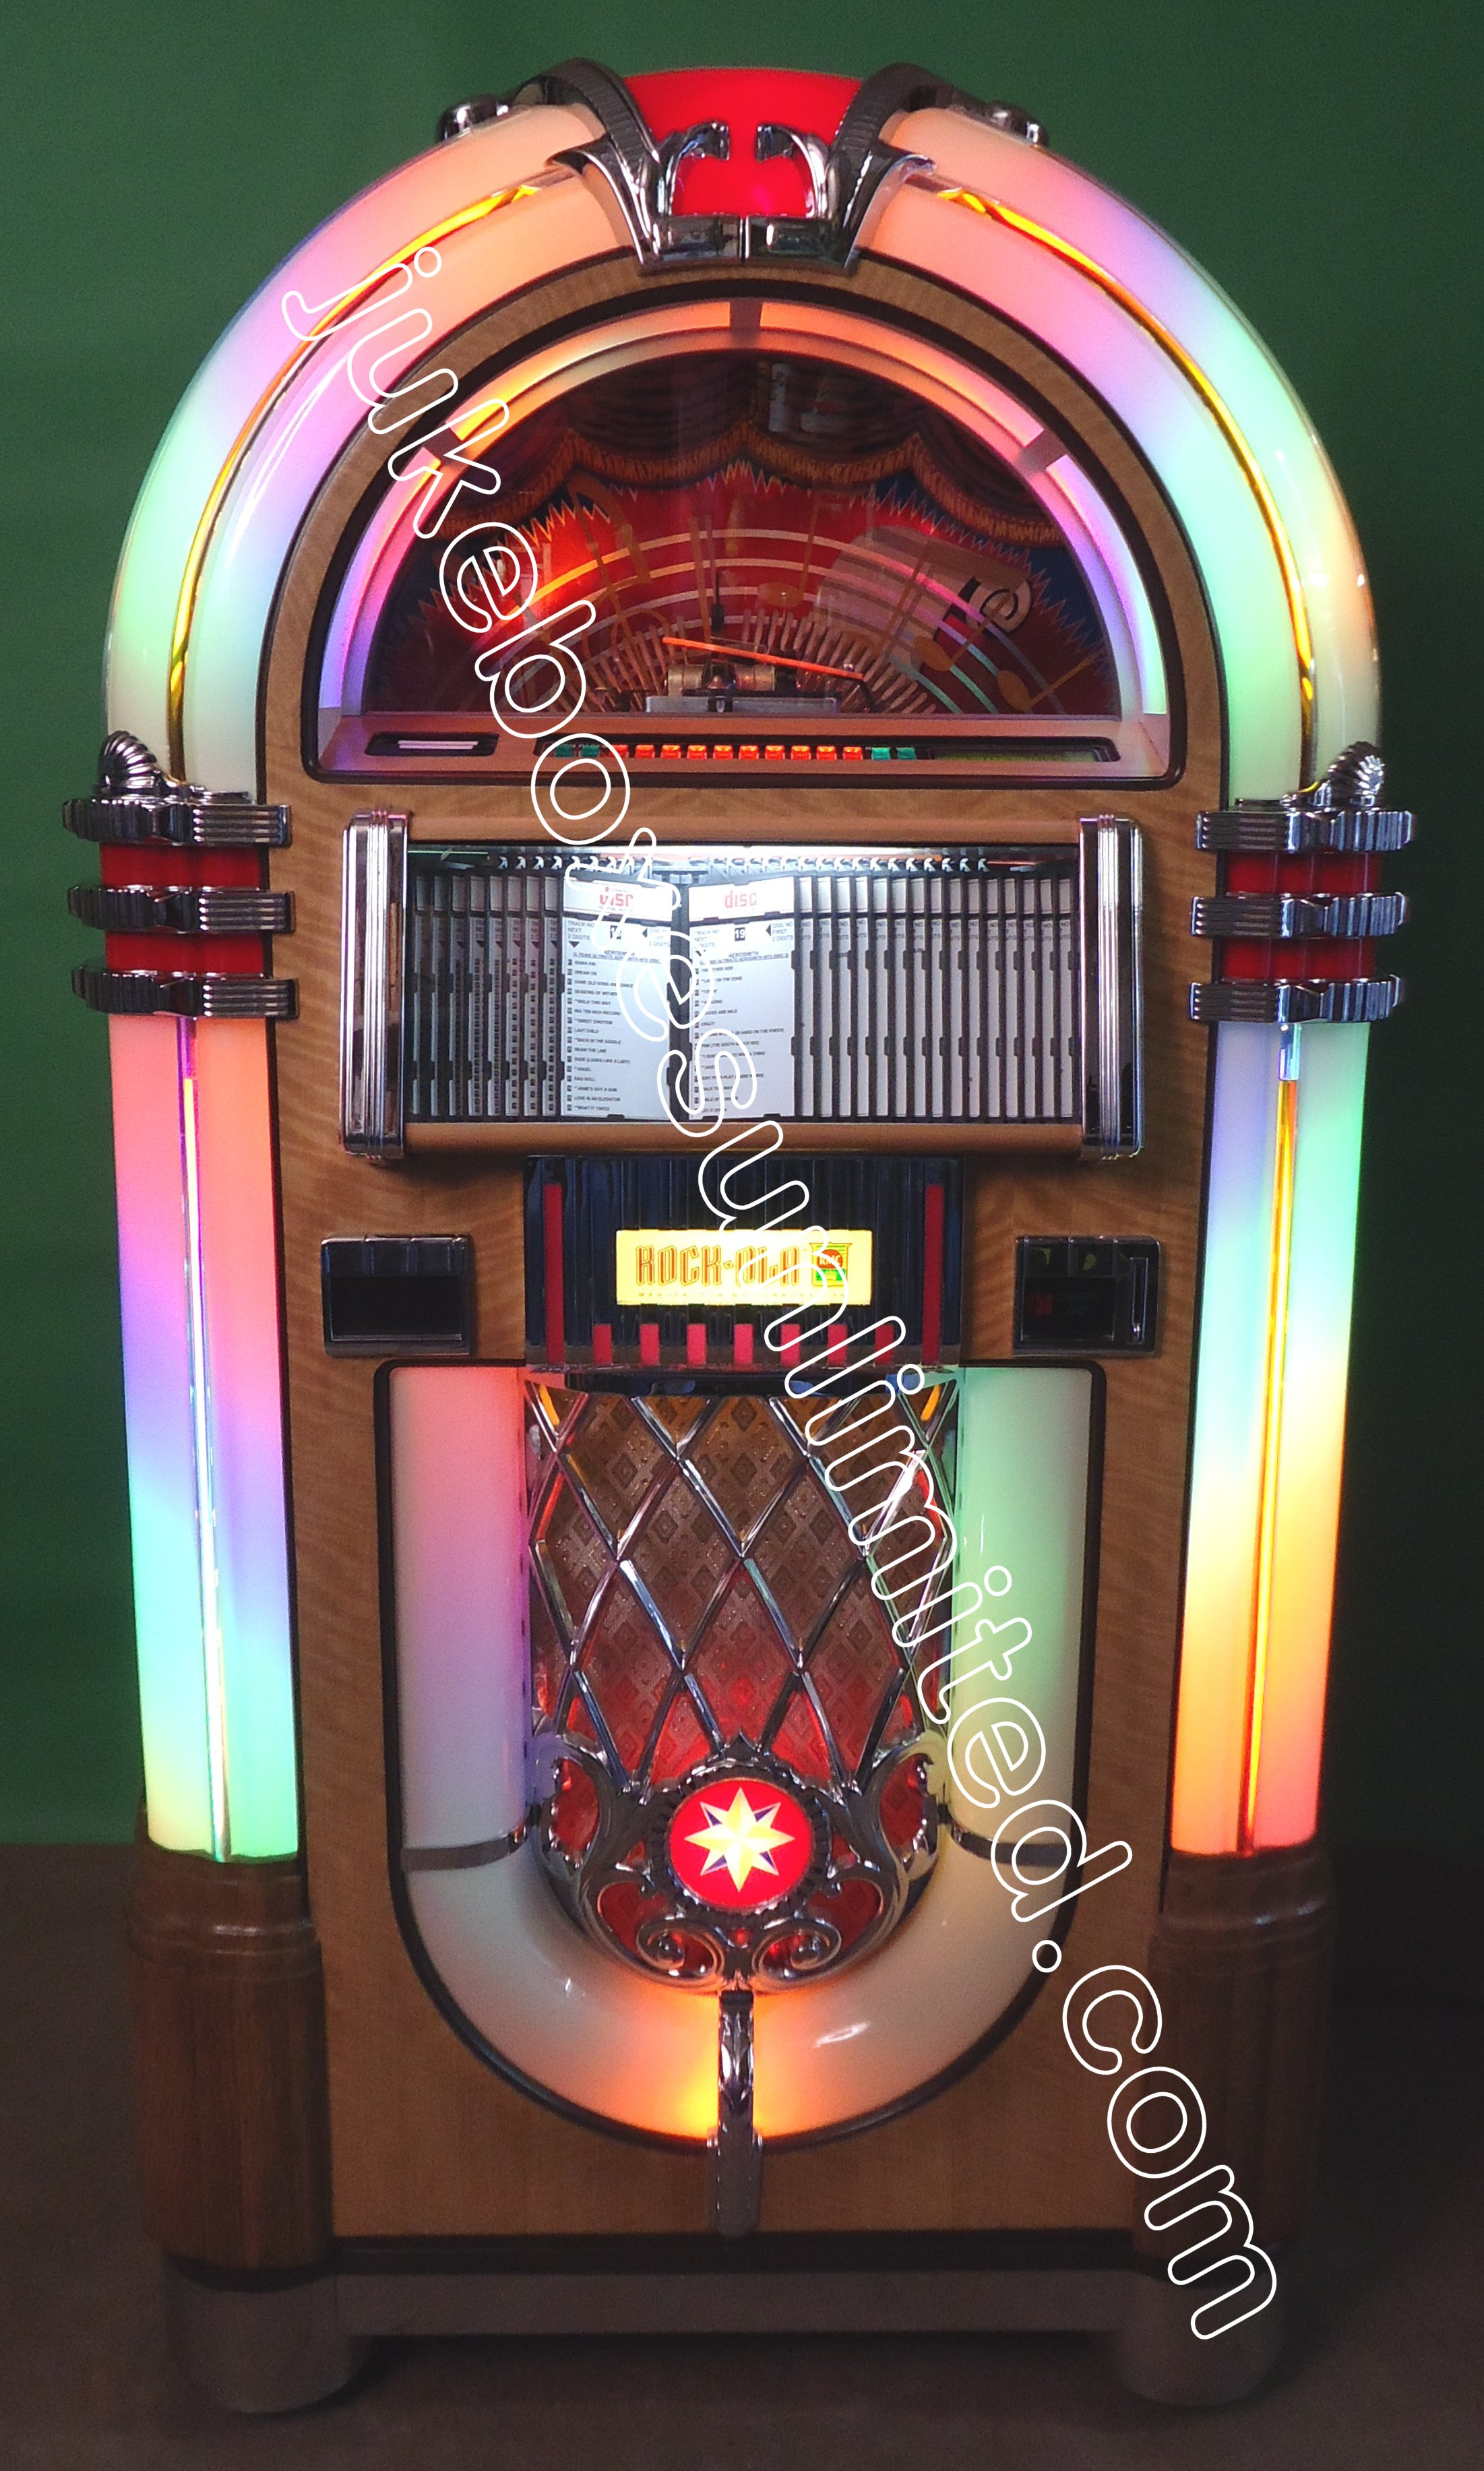 Rockola Jukebox Values 2000 Rockola cd Jukebox